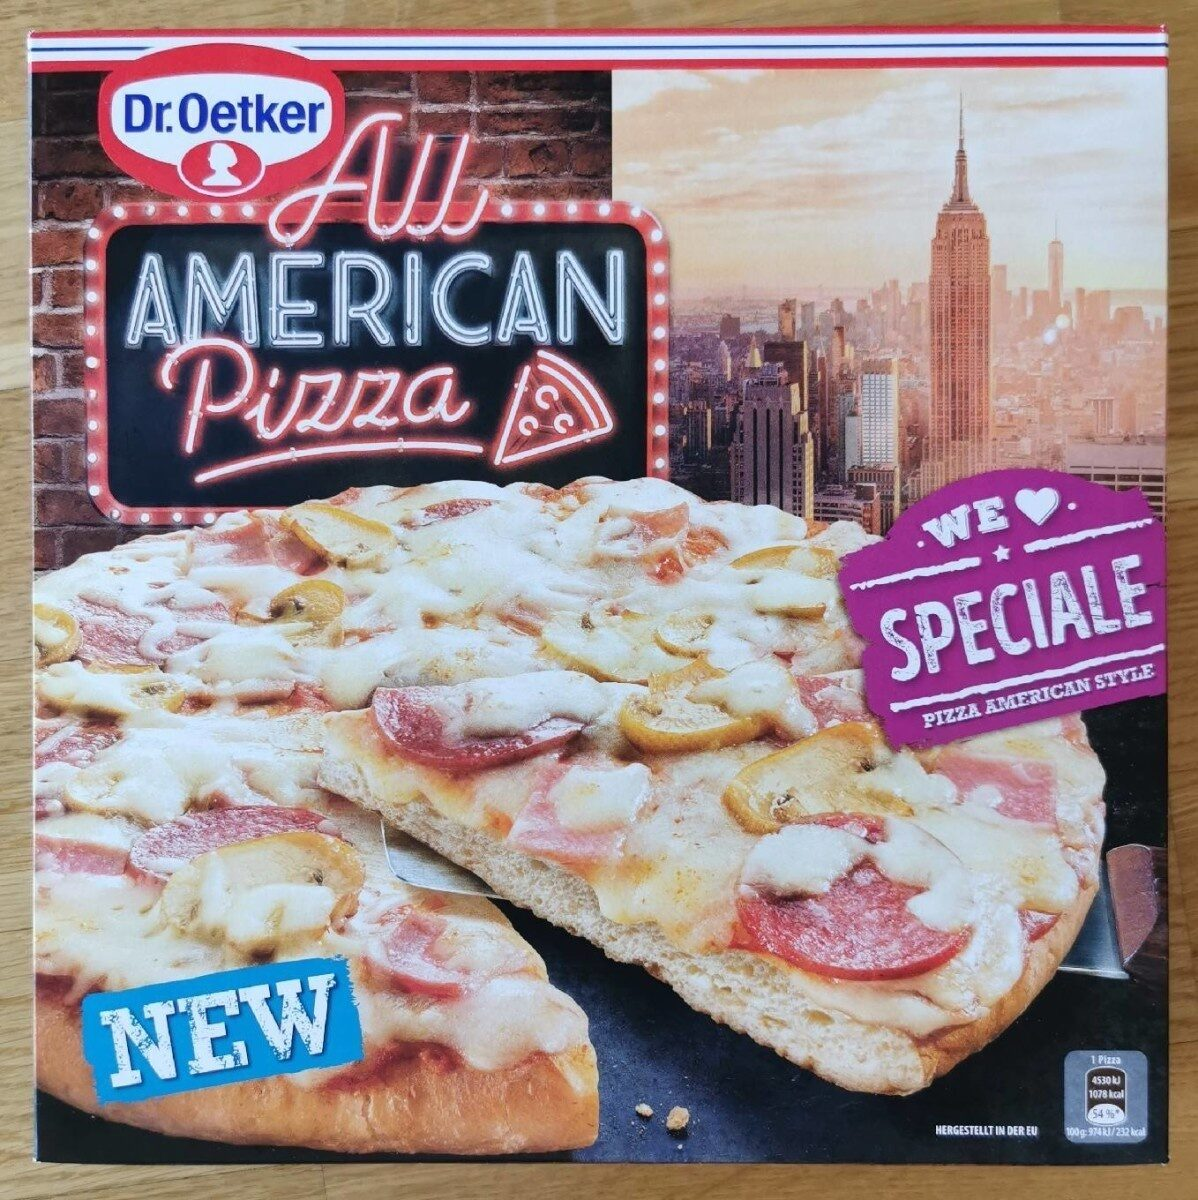 All American Pizza - Speziale - Produkt - de